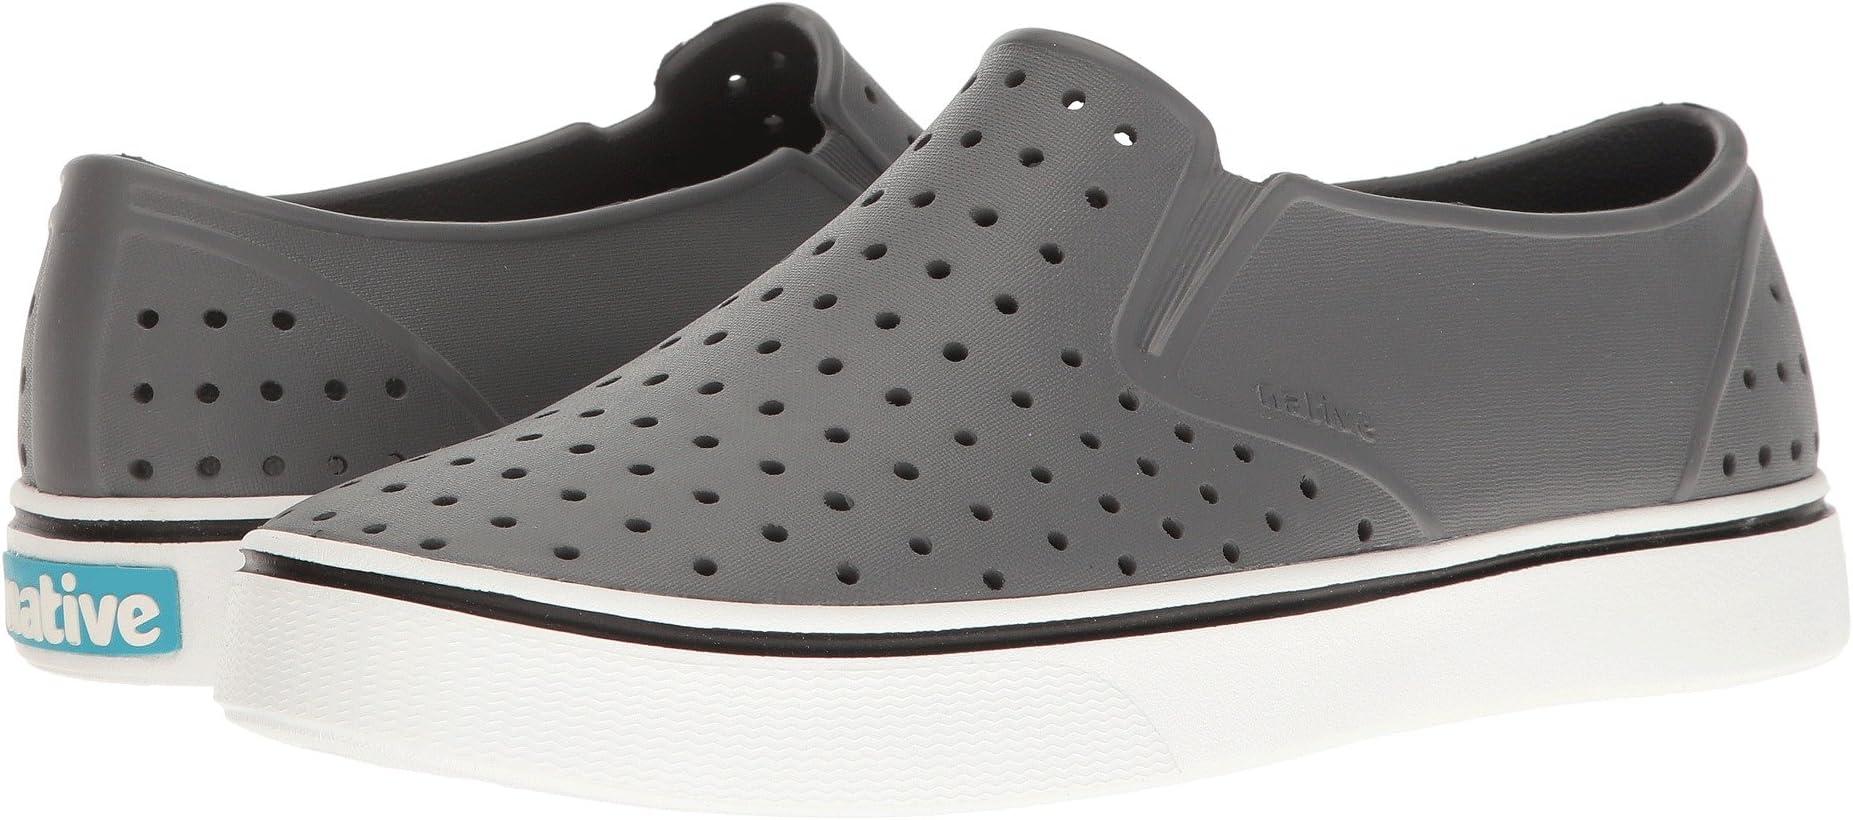 511198e687c2 Native Shoes for men